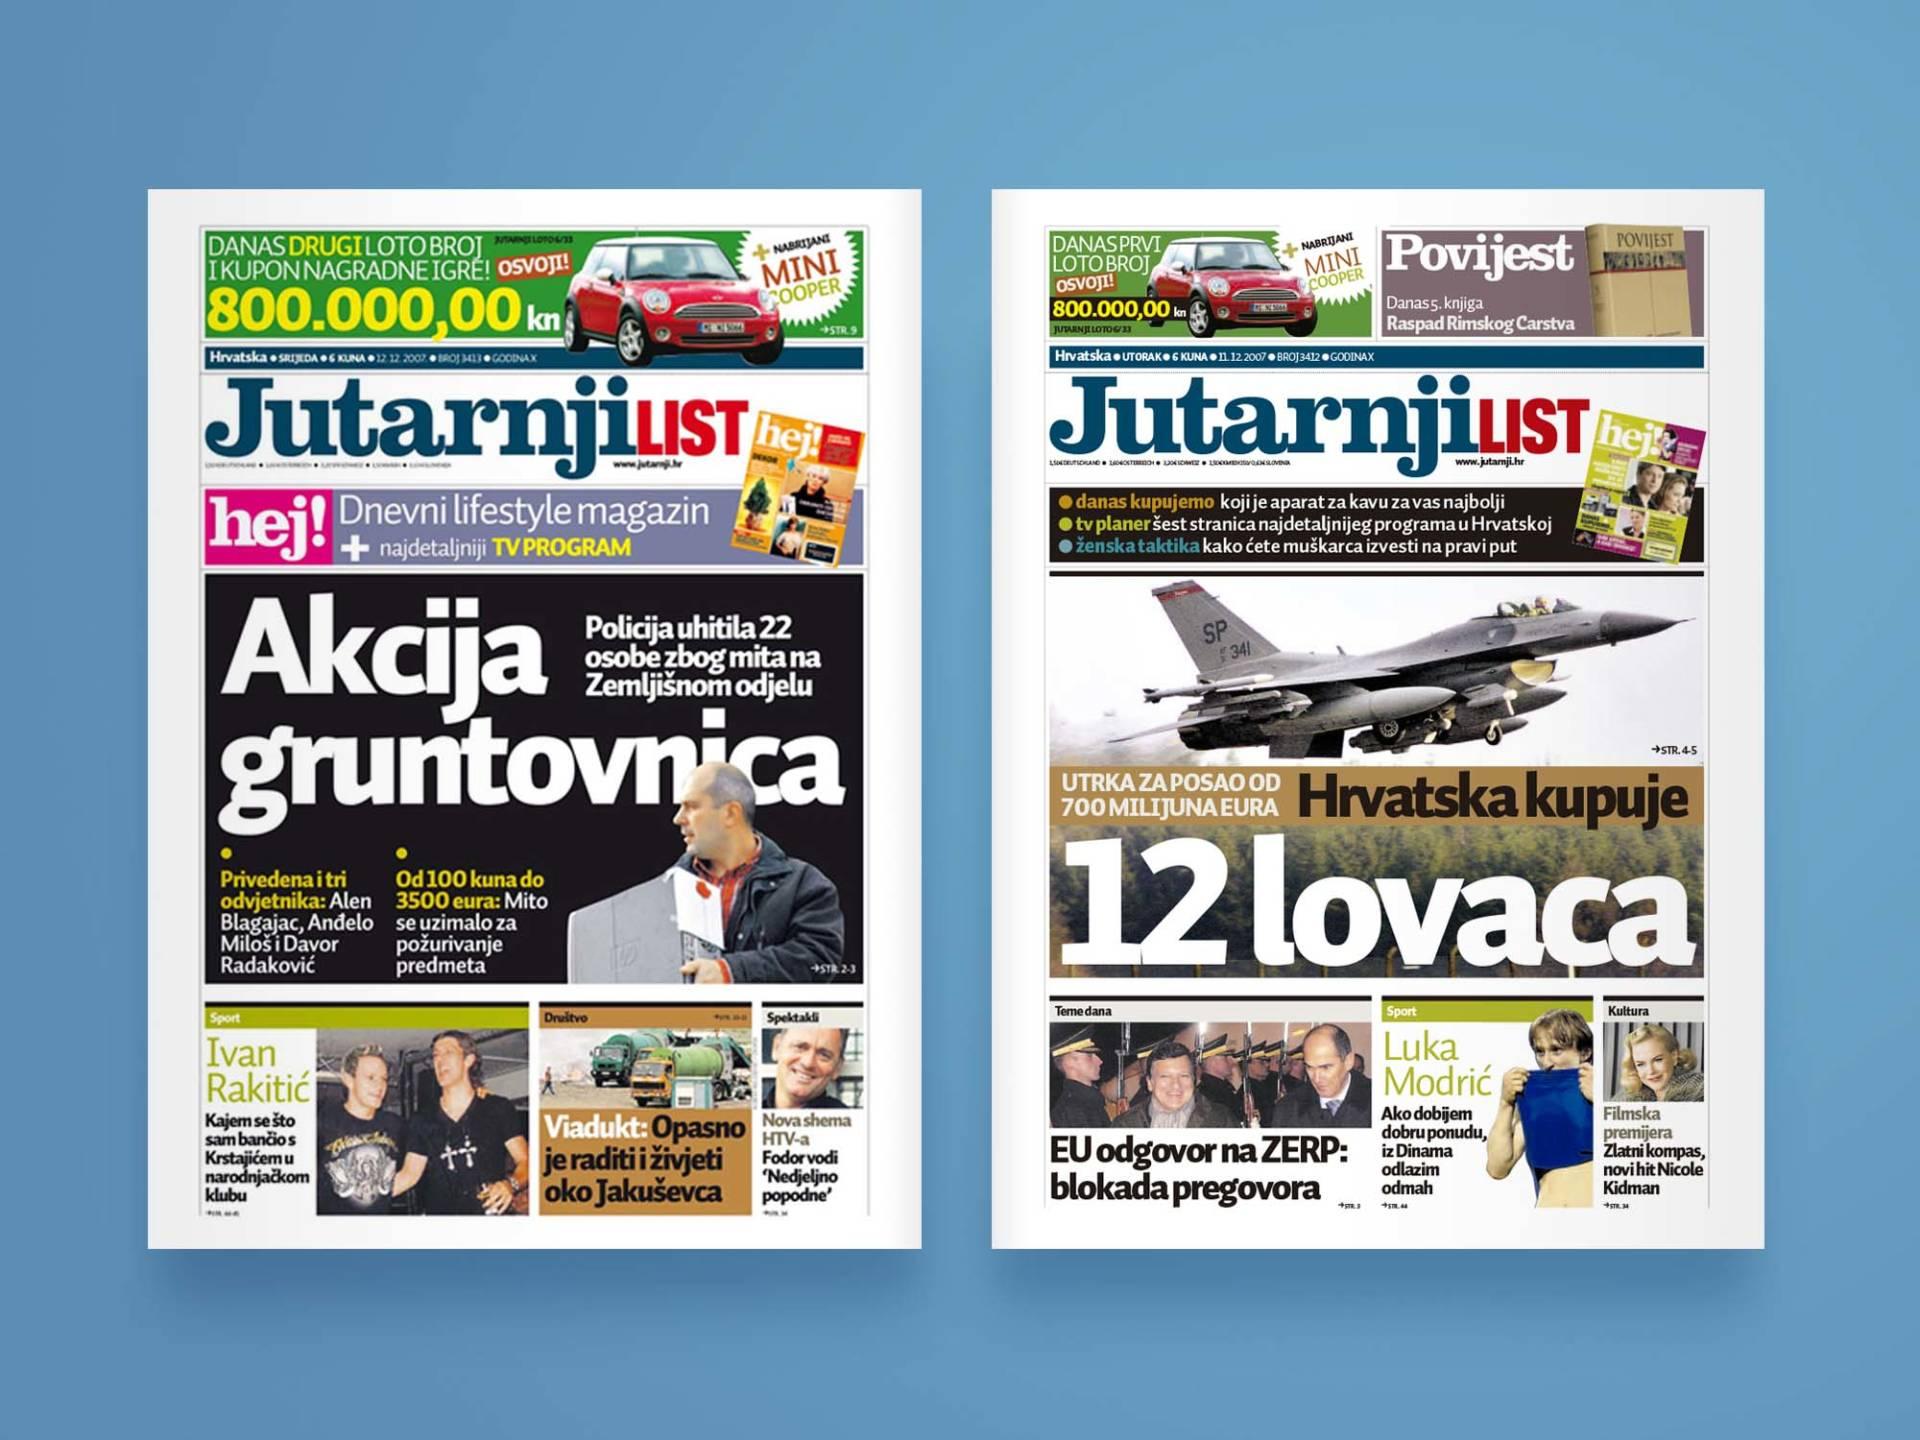 Jutarnji_List_06_Wenceslau_News_Design